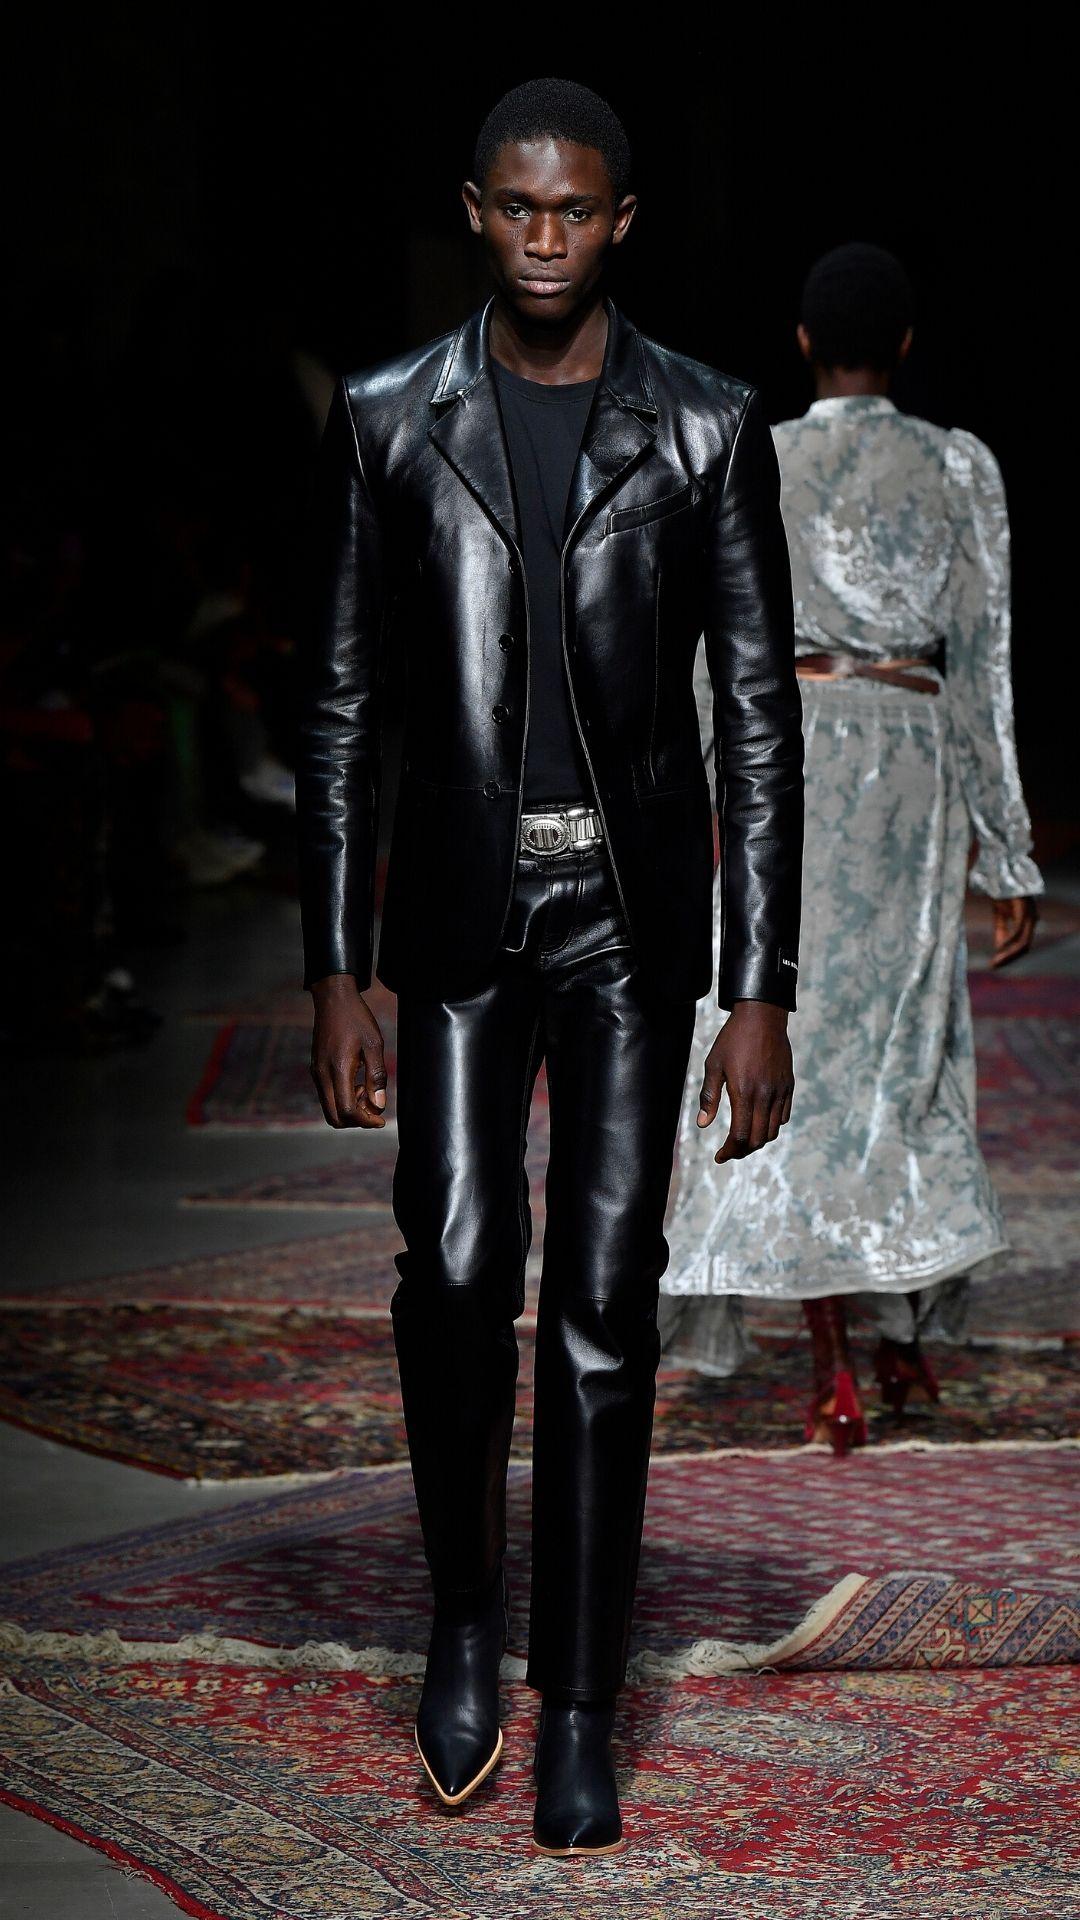 les benjamins, interview, menswear, fashion, 2020, esquire